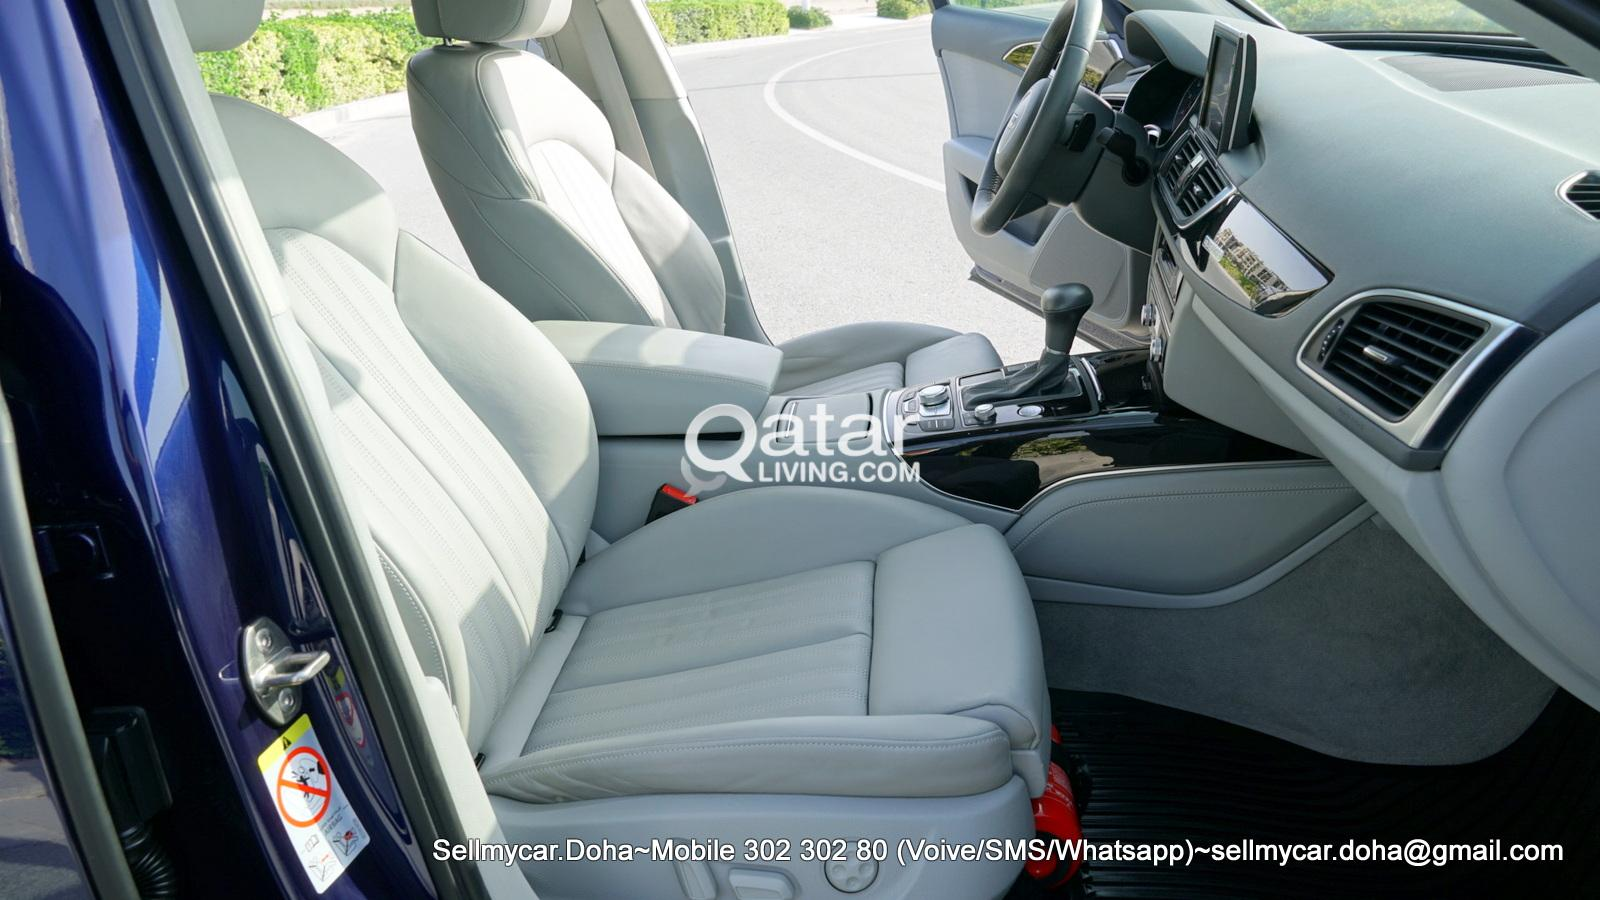 2015 Audi A6 50 TFSI S-Line Quattro (Many More Pho